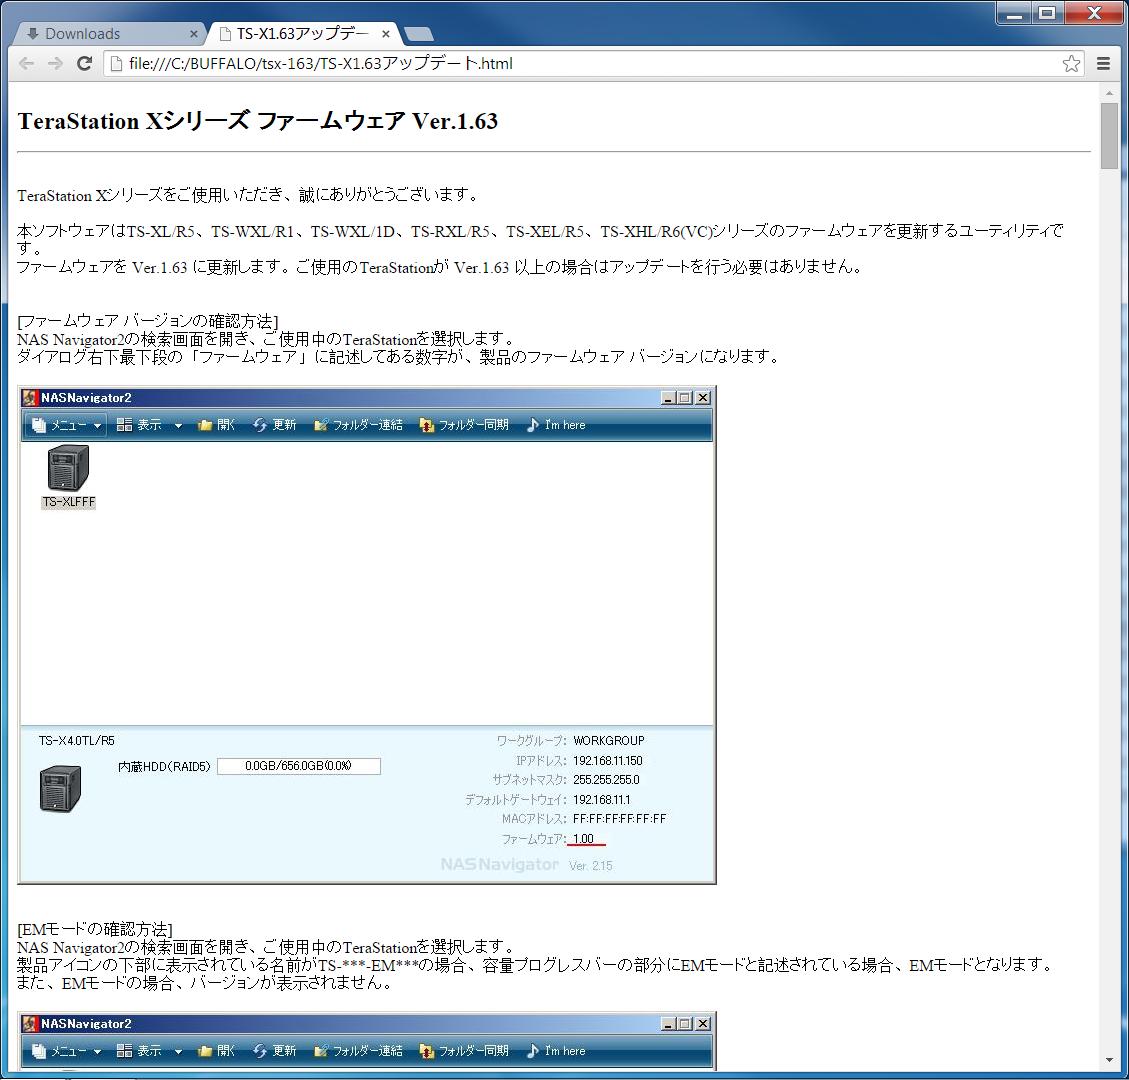 f:id:atsuhiro-me:20151104005102p:plain:w300